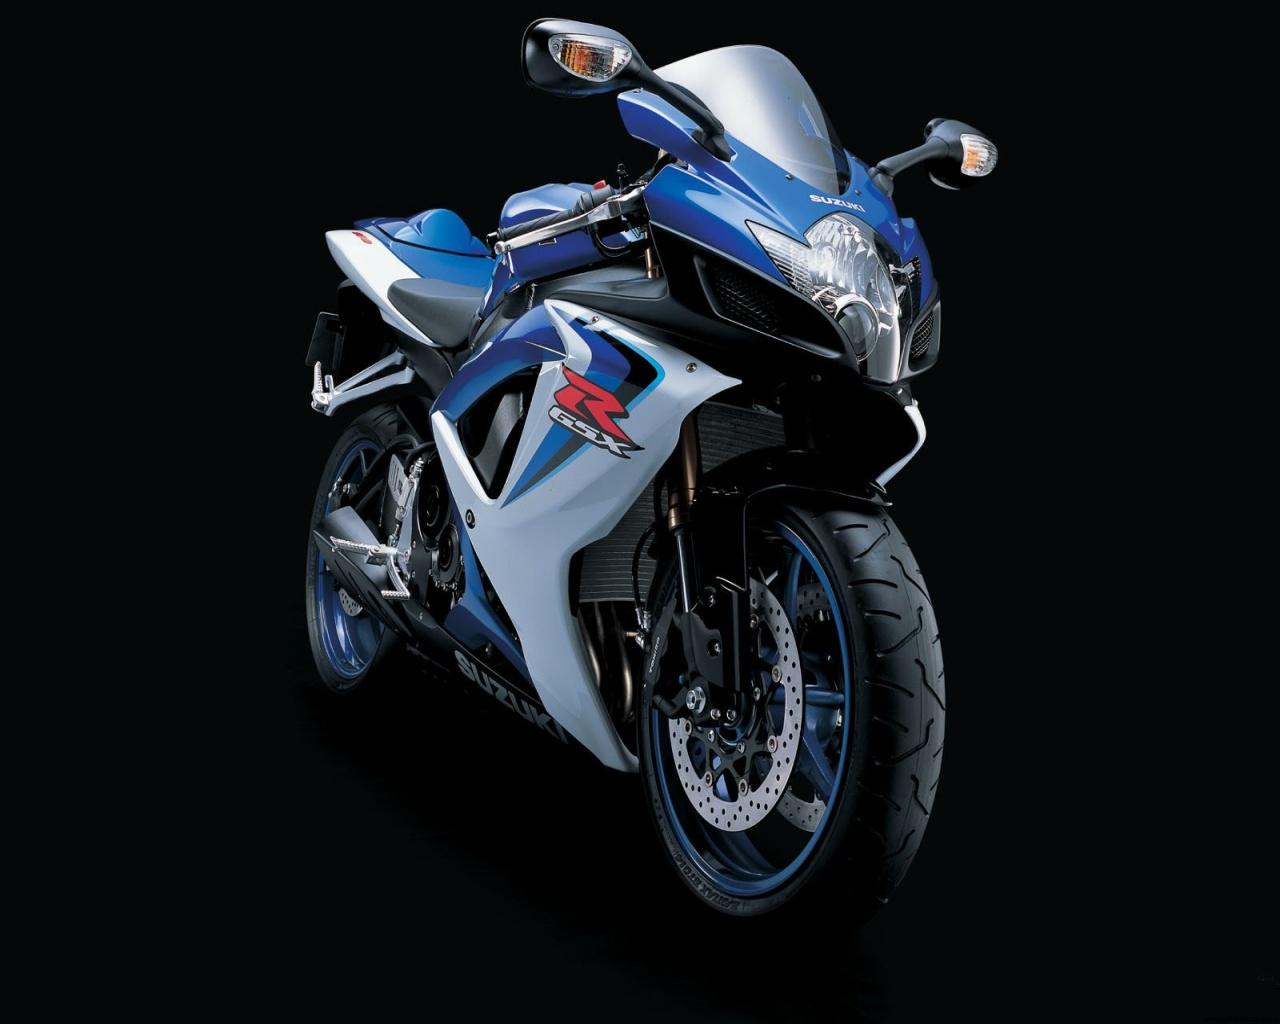 Suzuki R GSX Bike Wallpapers HD Wallpapers 1280x1024